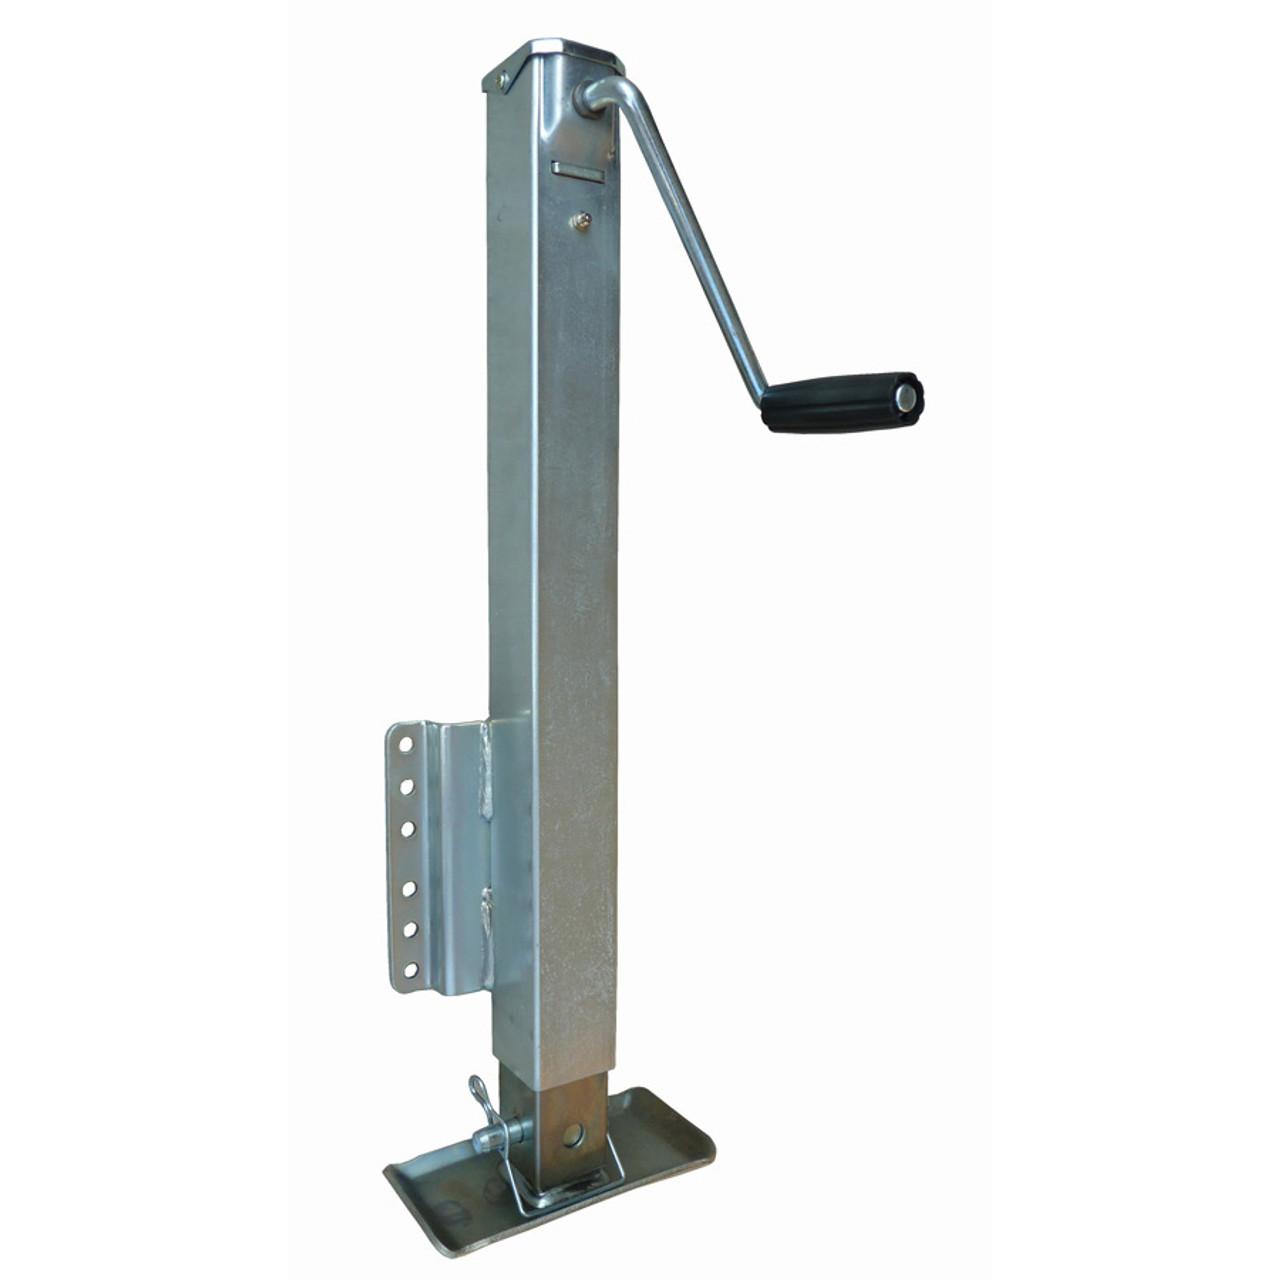 RAM2500 --- RAM Fixed Mount Drop Leg Jack with Footplate - 2,500 lb